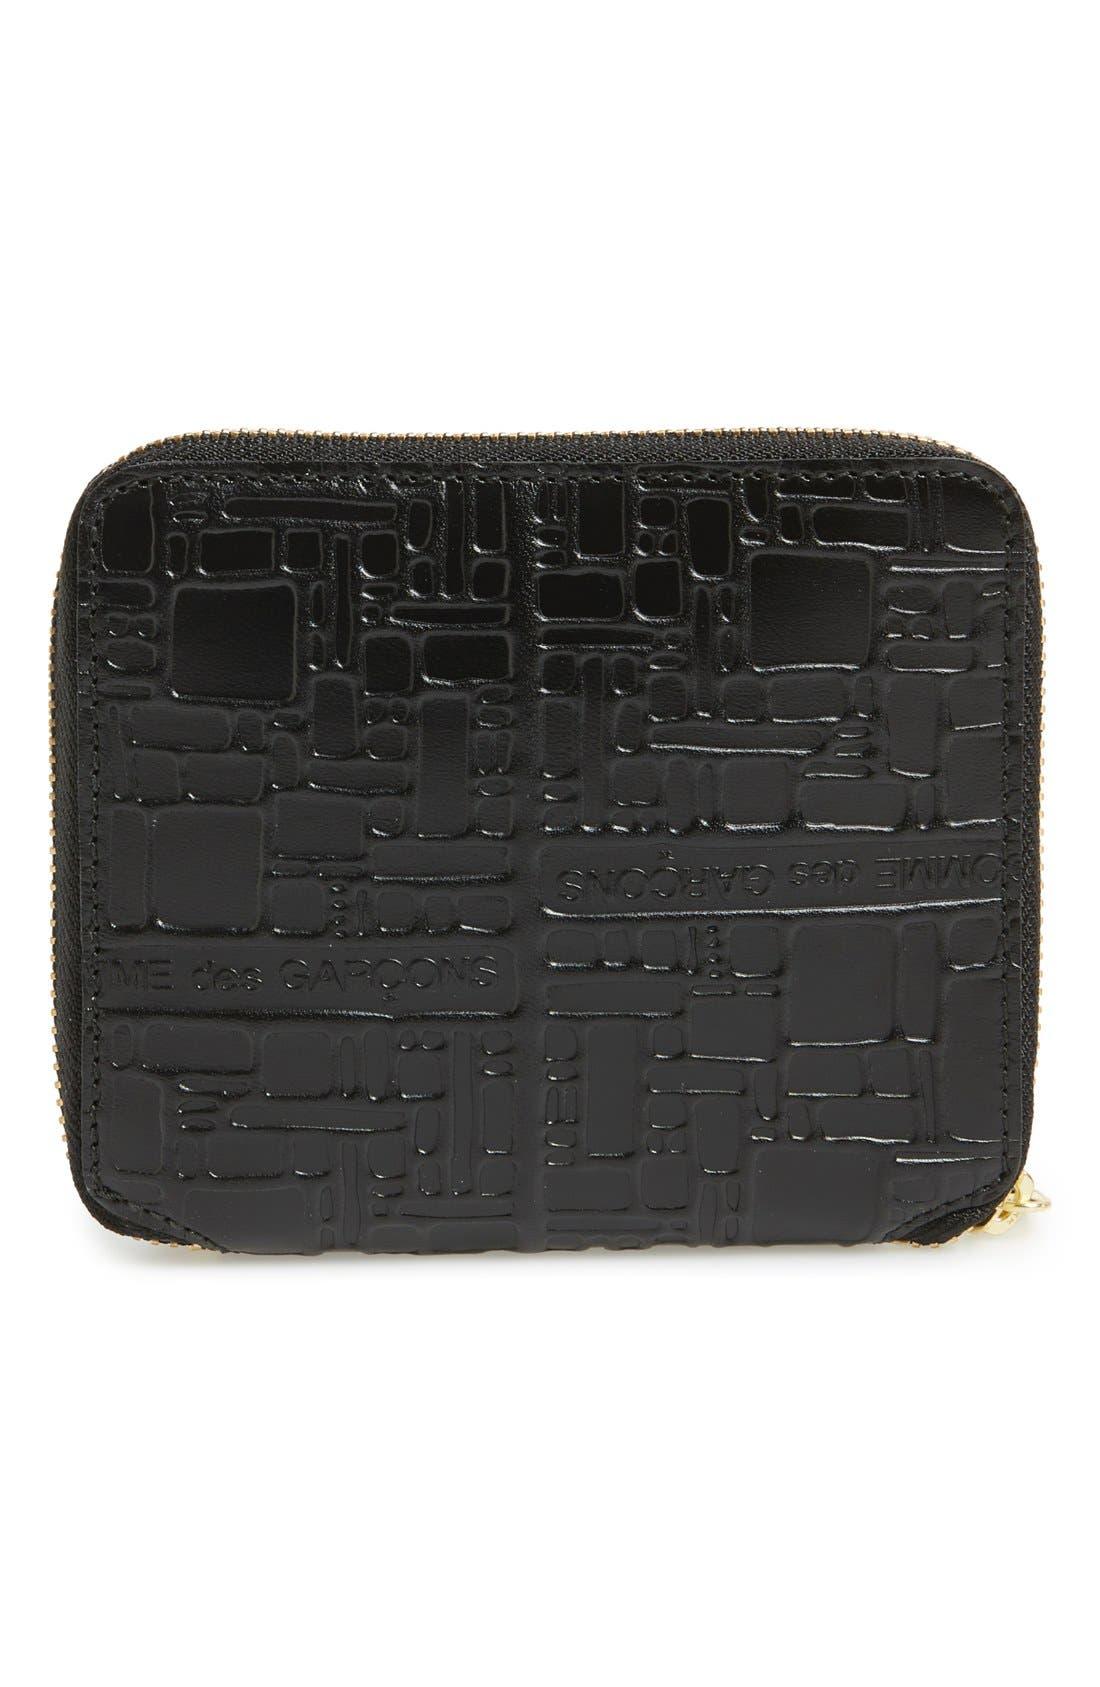 Comme de Garçons Embossed French Wallet,                             Alternate thumbnail 2, color,                             Black